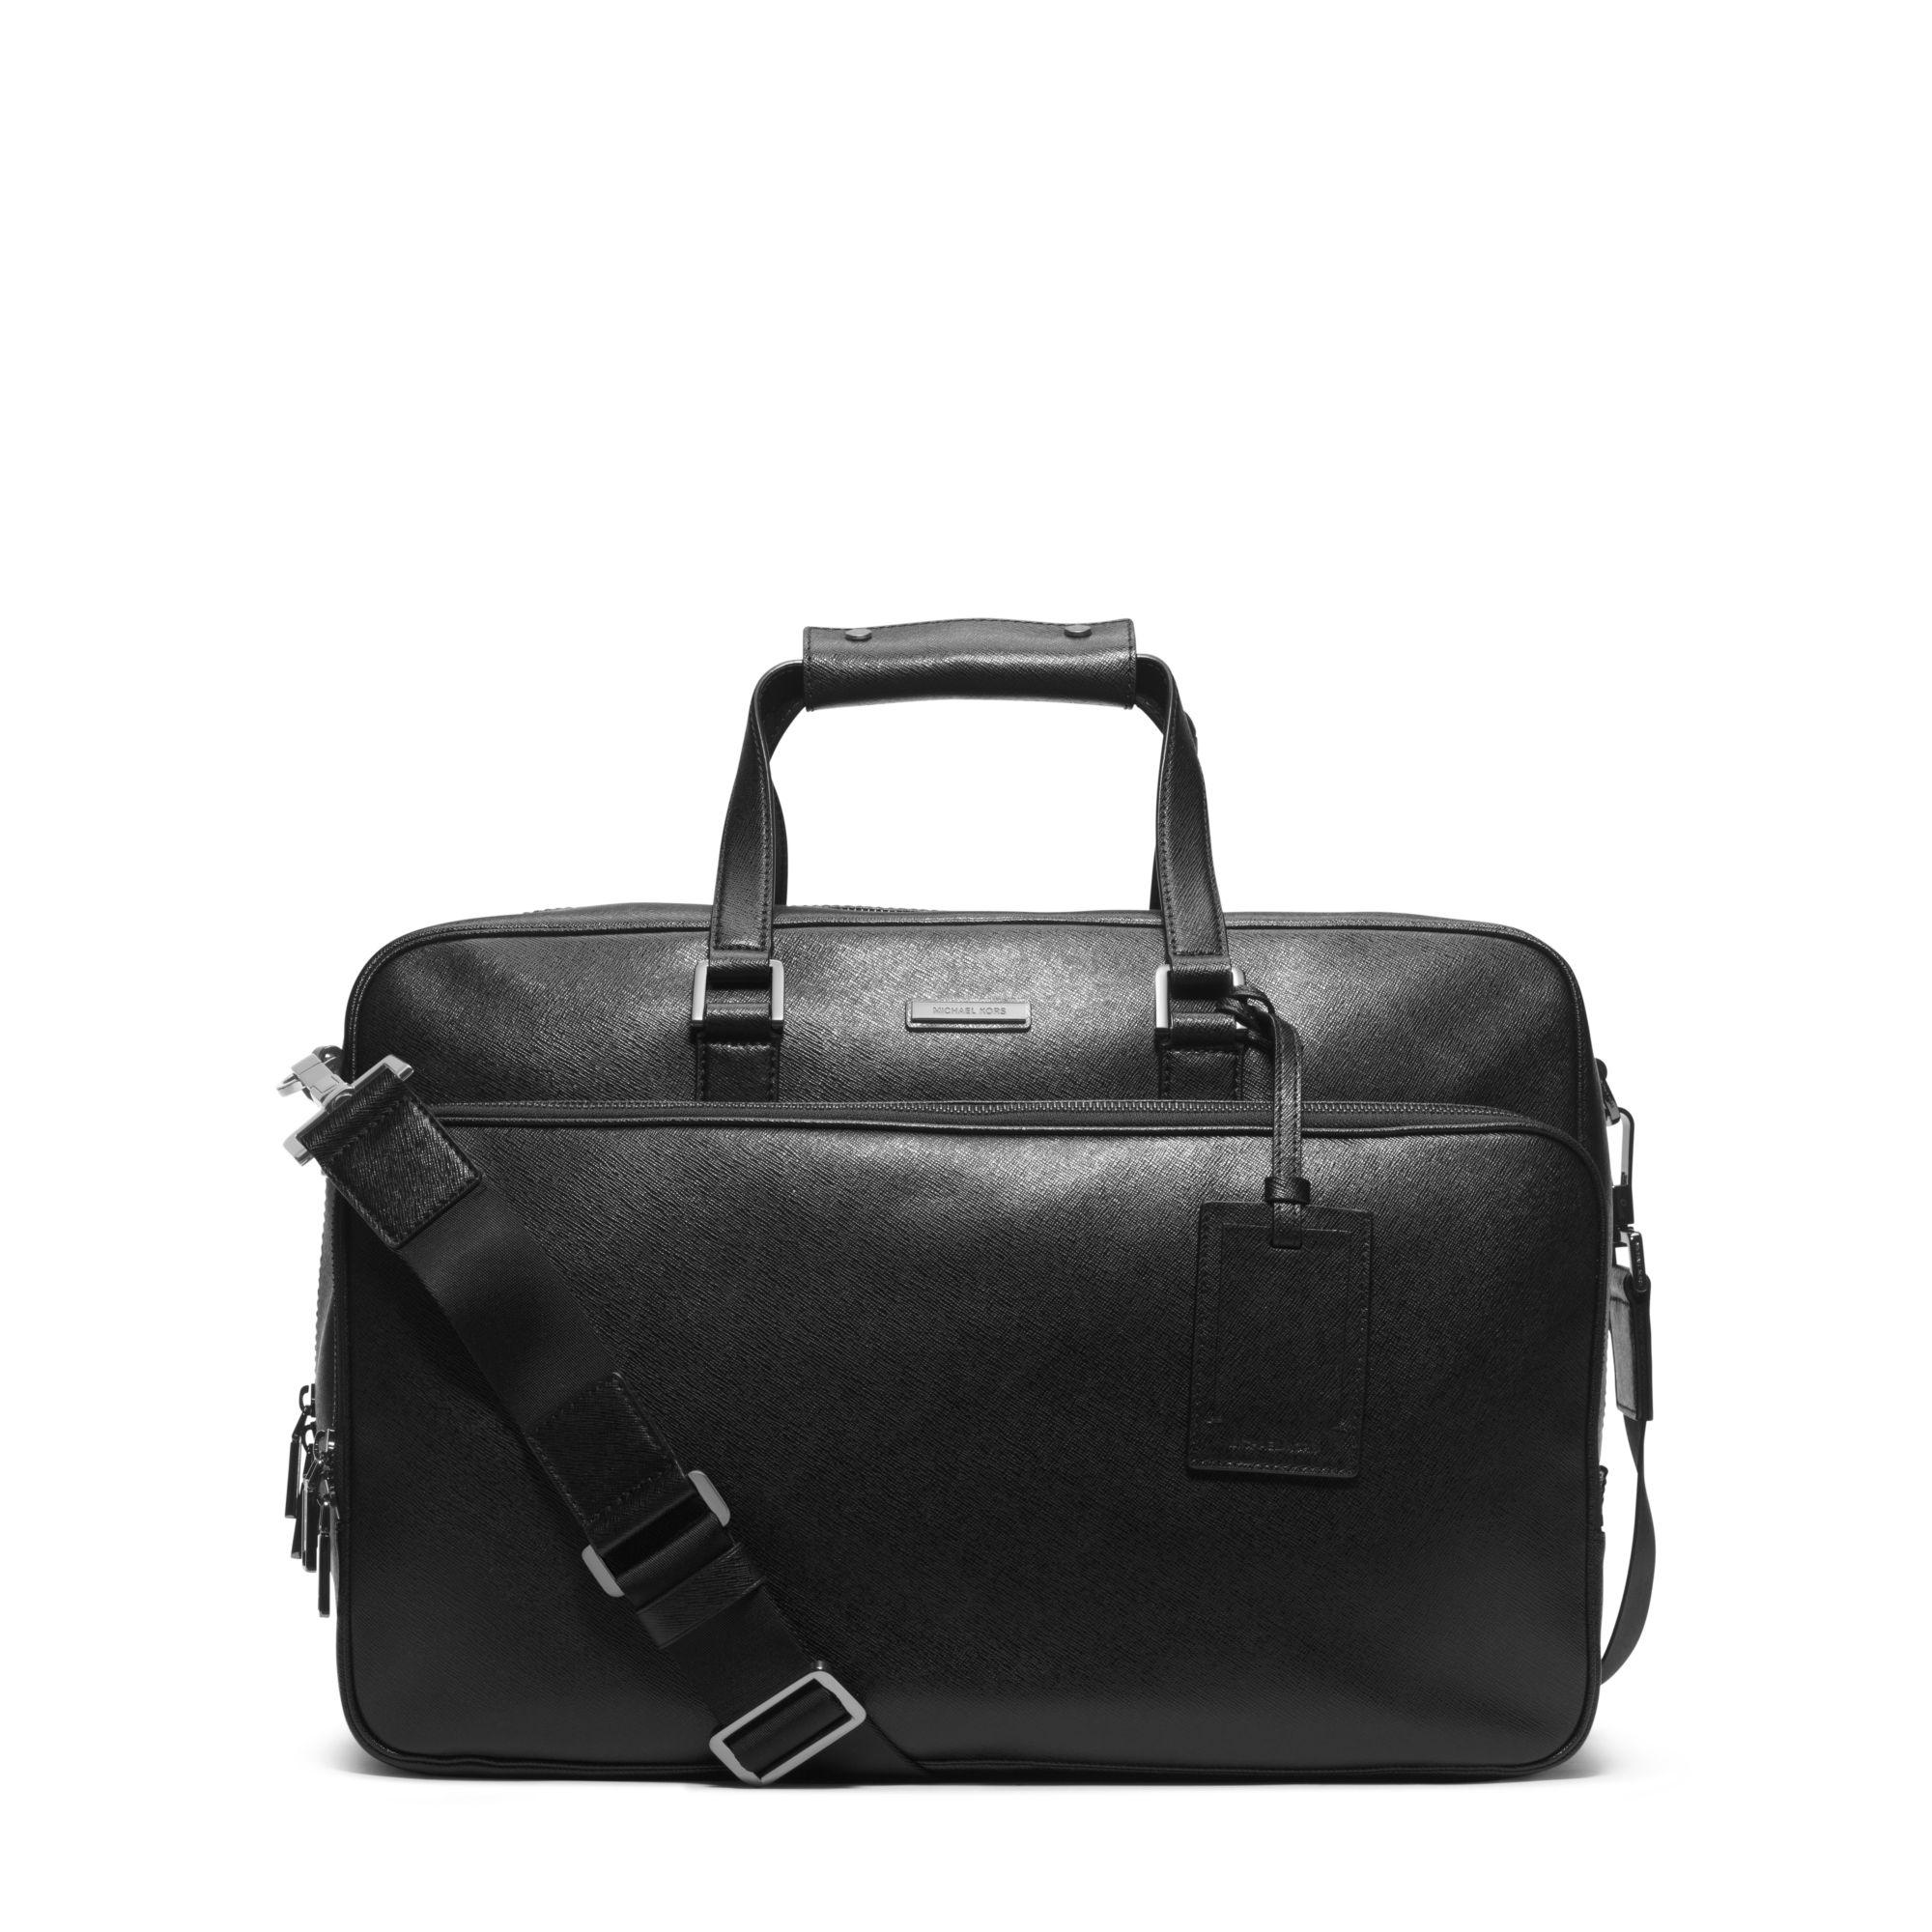 Michael Kors Jet Set Travel Käsilaukku : Michael kors jet set travel leather carry on in black for